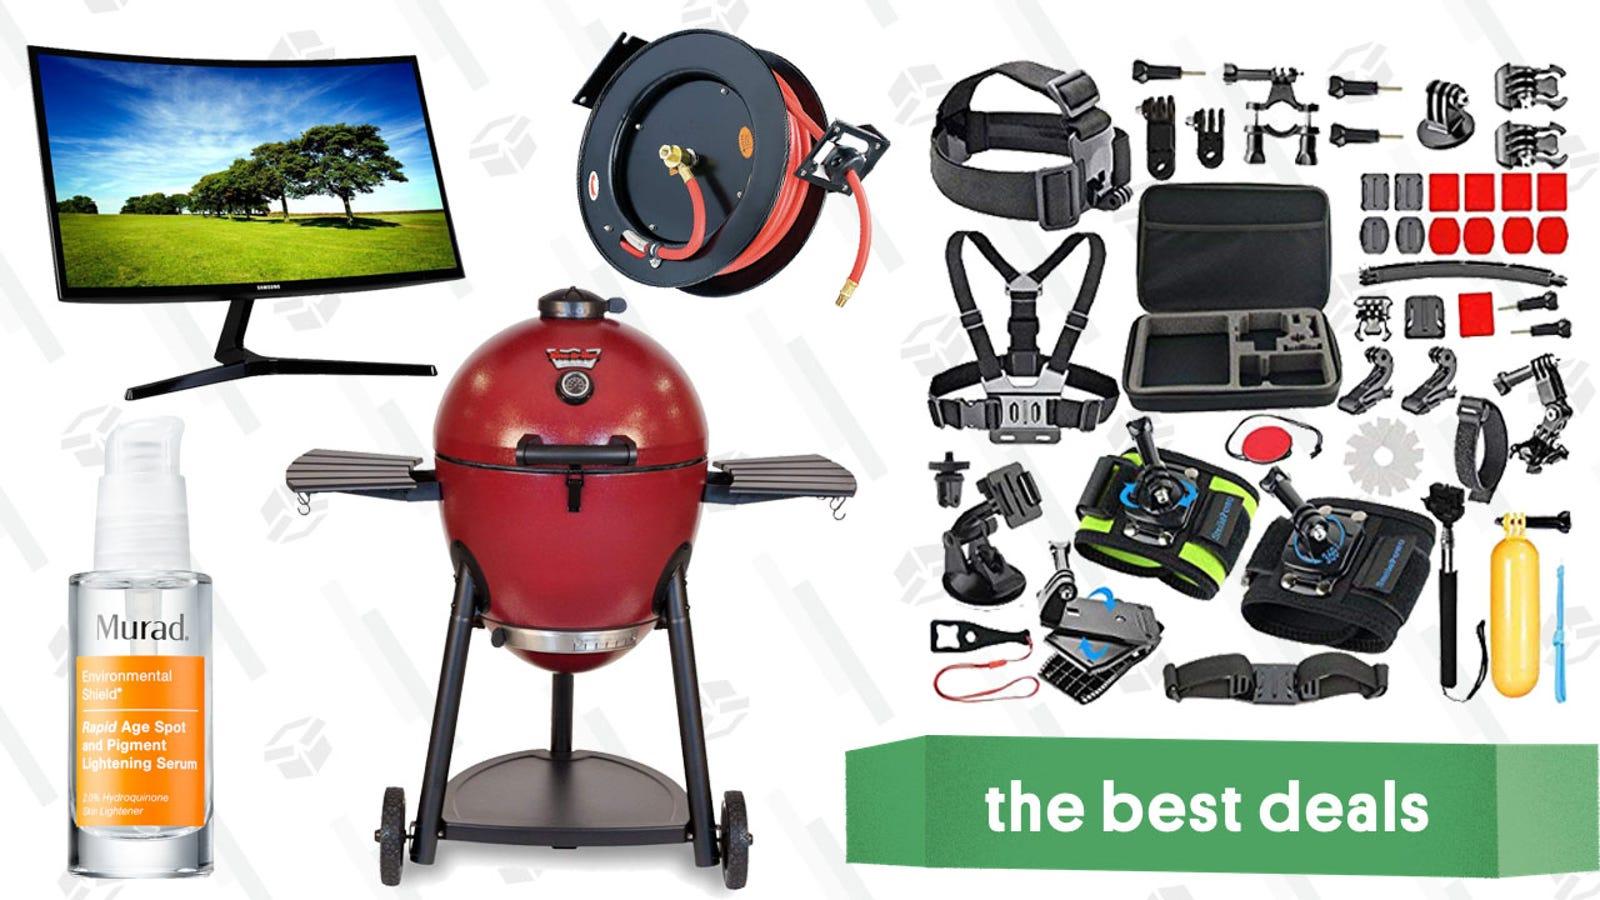 Saturday's Best Deals: Casper, Curved Computer Monitor, Murad Serum, and More